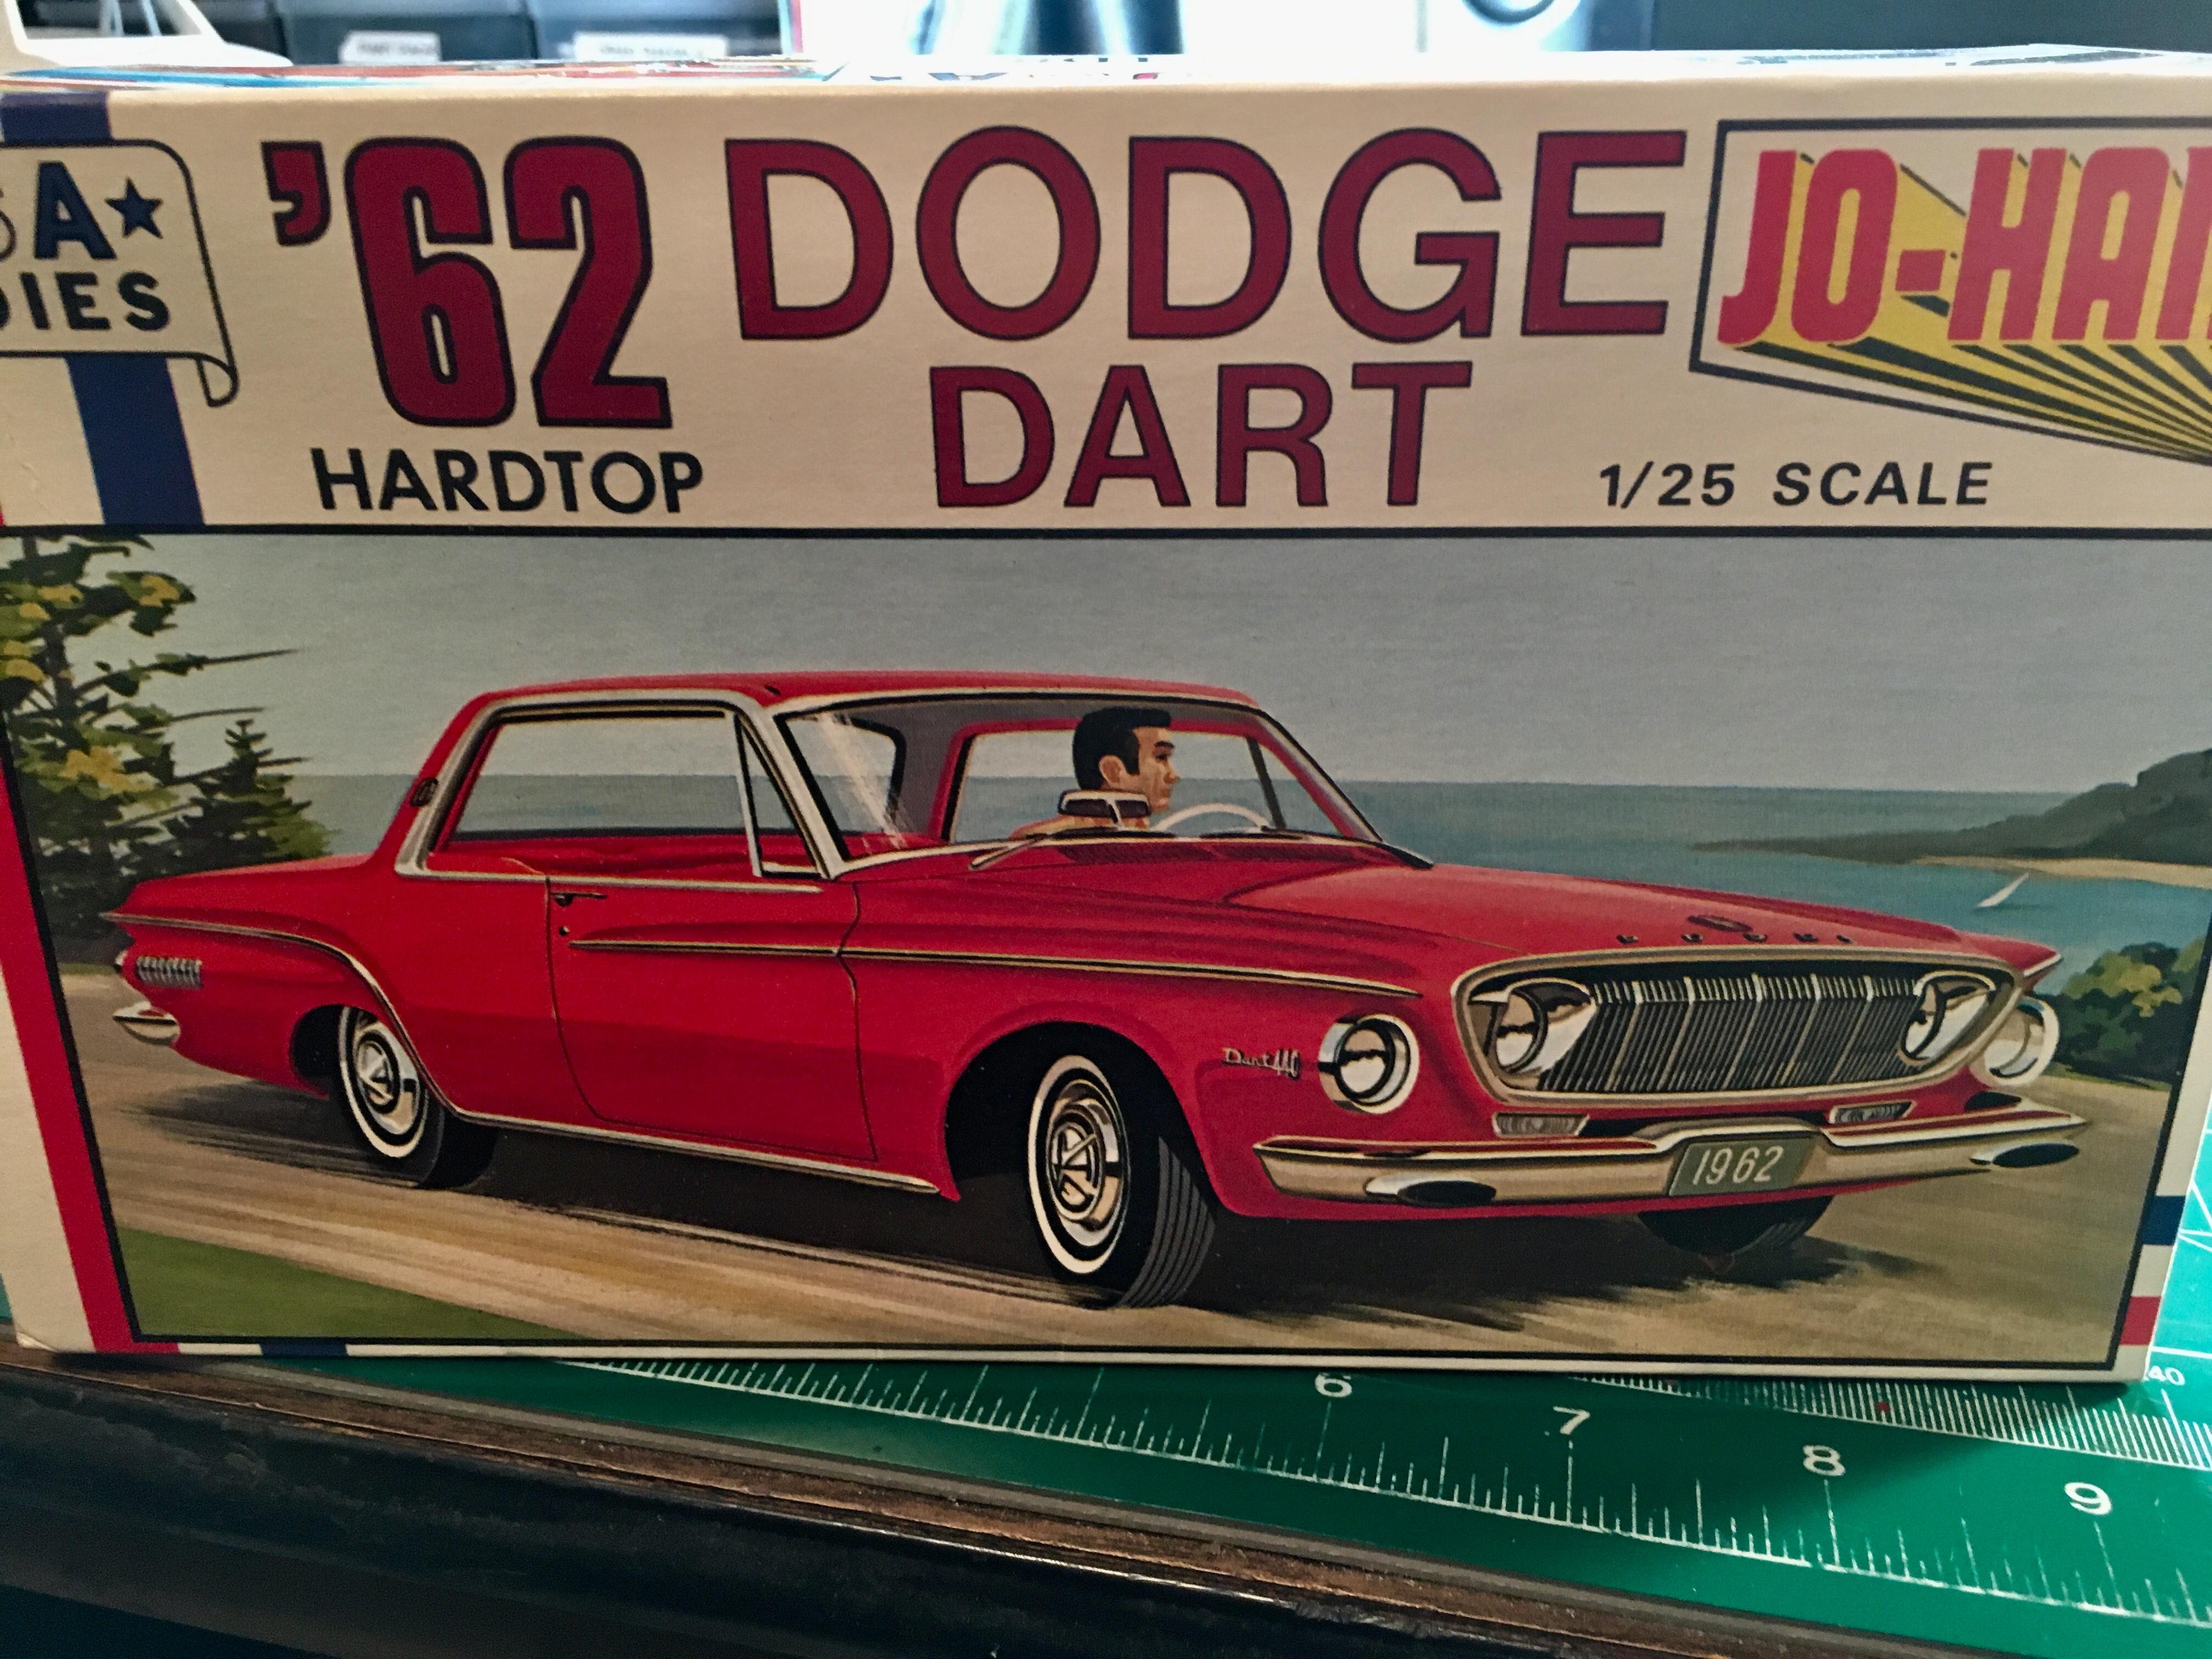 Johan 1962 Dodge Dart 413 Max Wedge Wip Model Cars Model Cars Magazine Forum